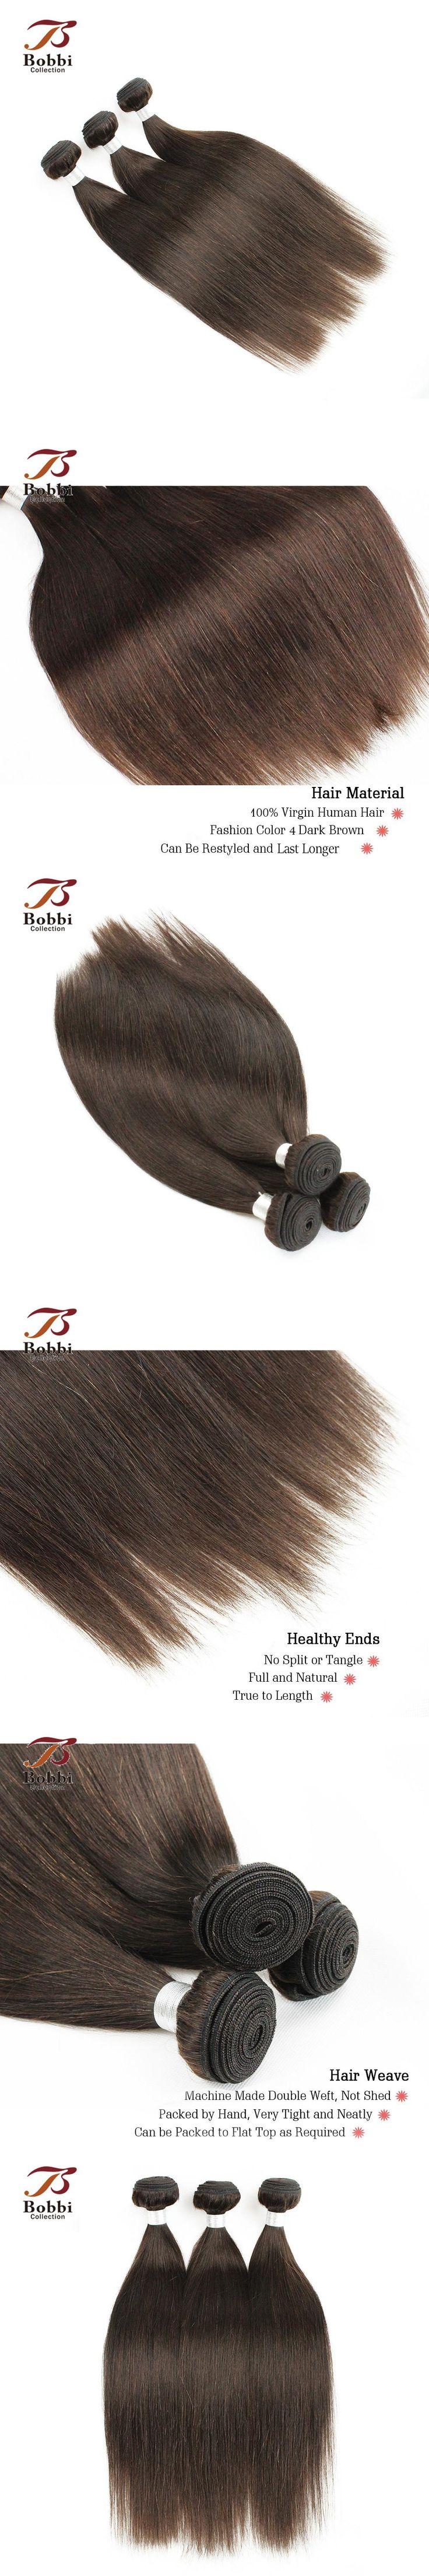 Malaysian Straight Hair Weave 4 Bundles Color 4 Dark Brown Human Hair Weft Malaysian Hair Extension Bobbi Collection